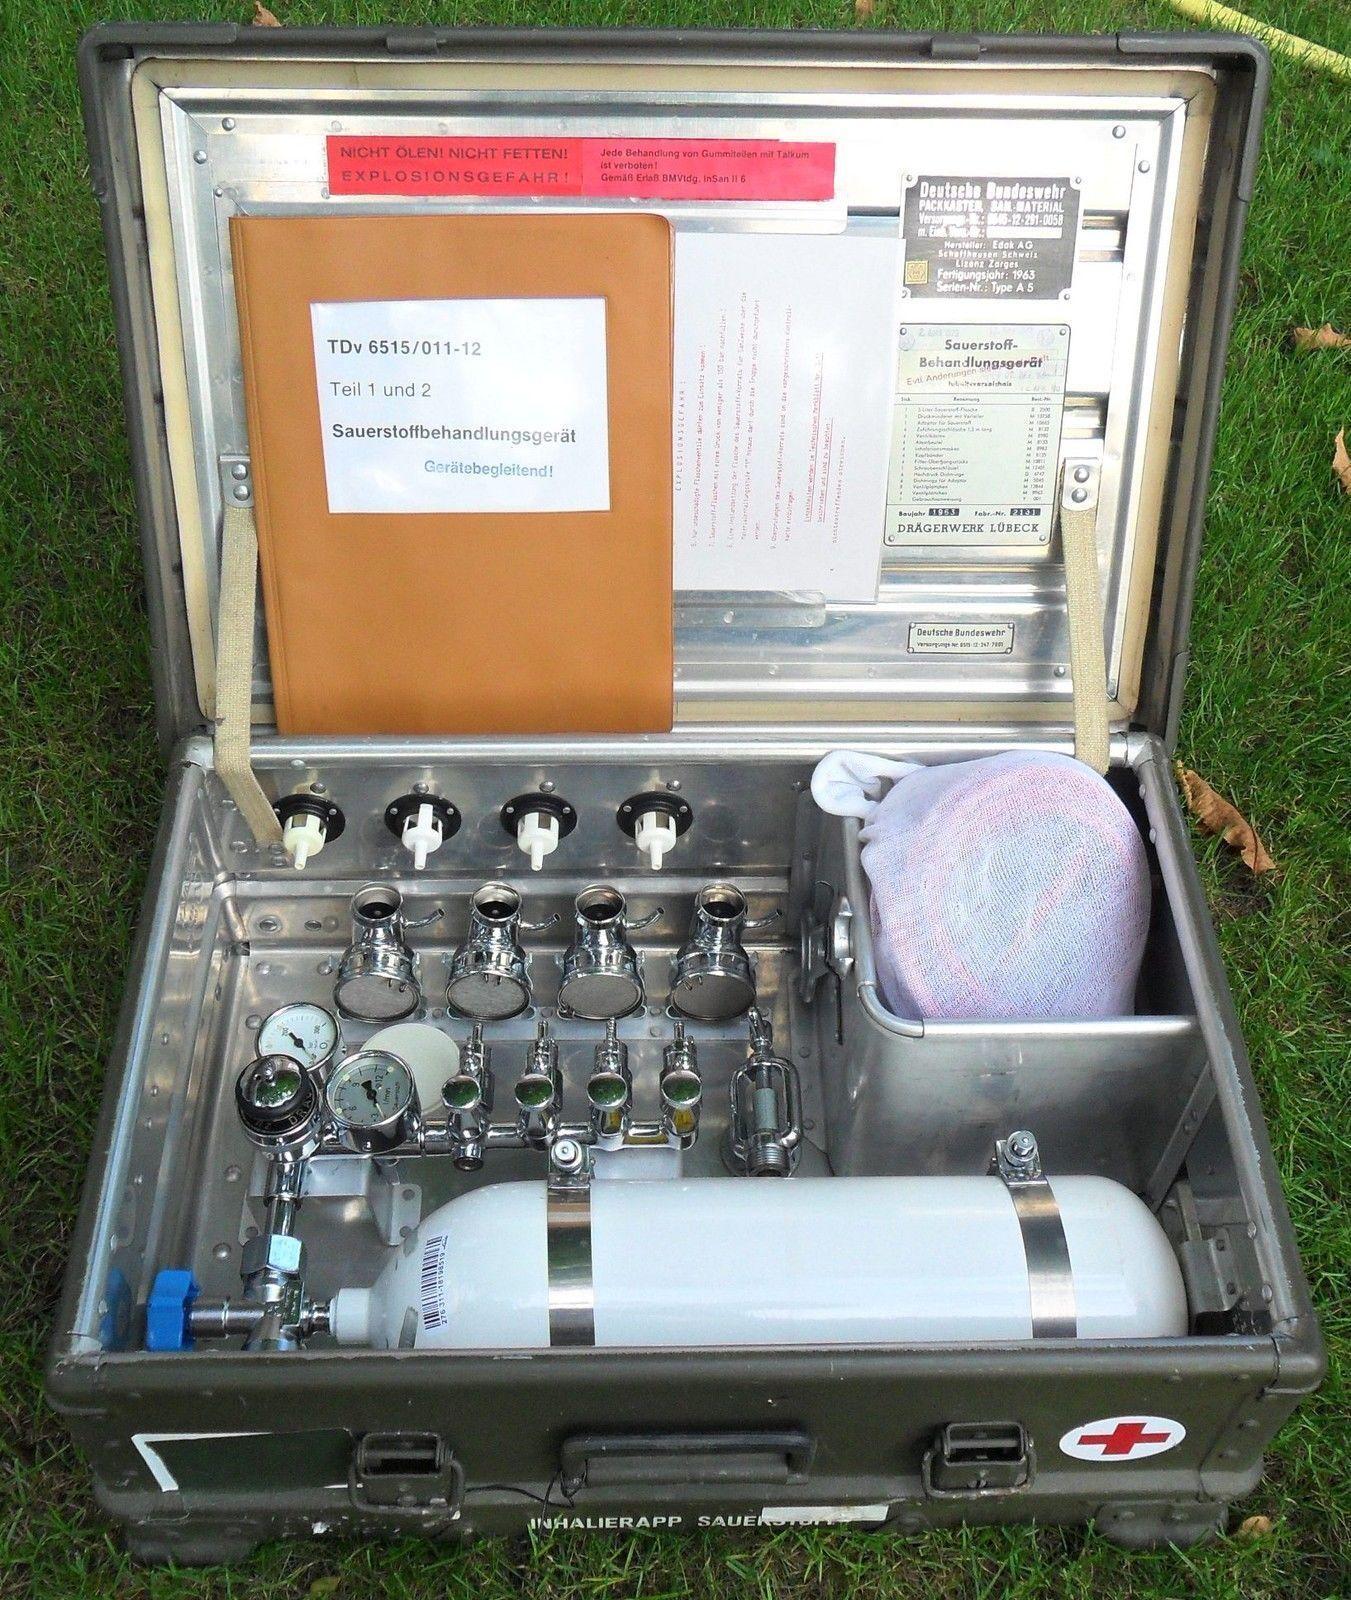 BW Zarges Kiste A5 NEUE BAUART Sauerstoff Inhaliergerät Dräger TÜV bis max 2027